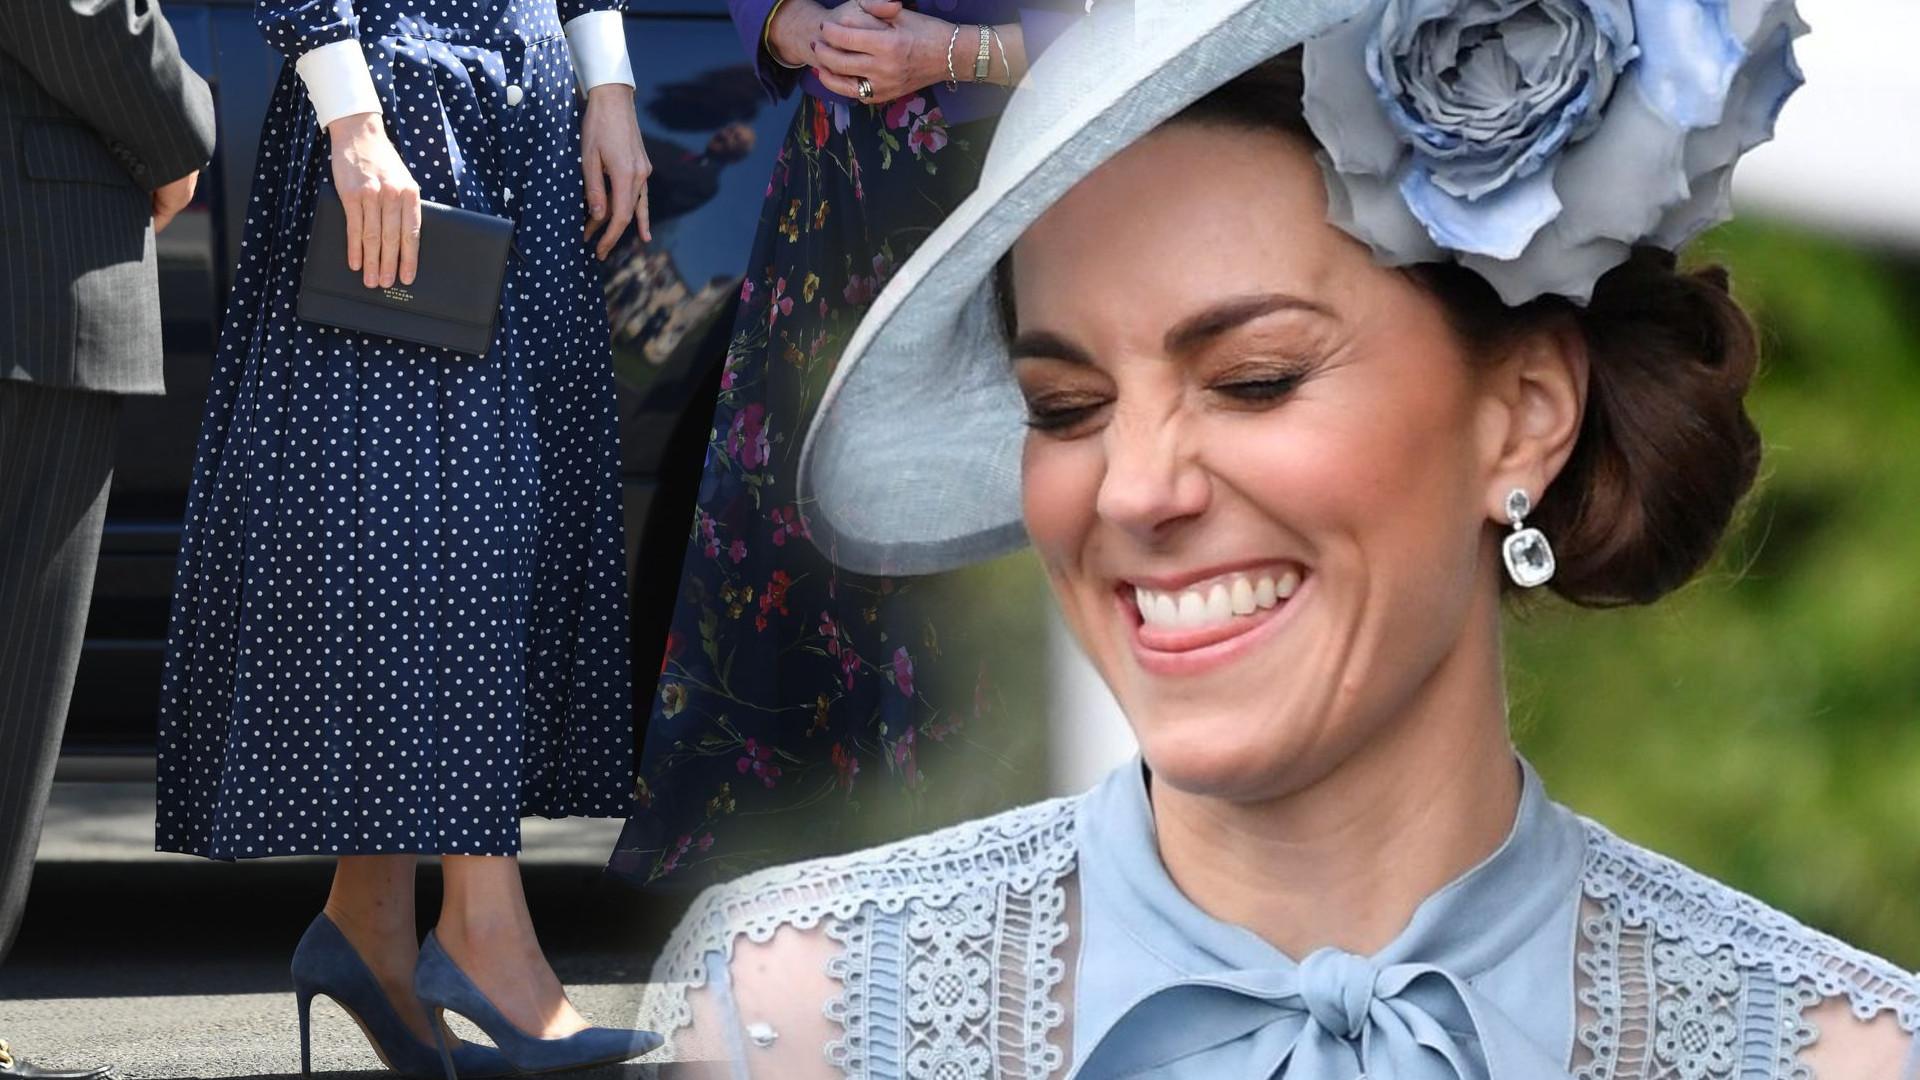 Kate Middleton ma banalny sposób na to, by stopy nie ślizgały się w butach na wysokich obcasach